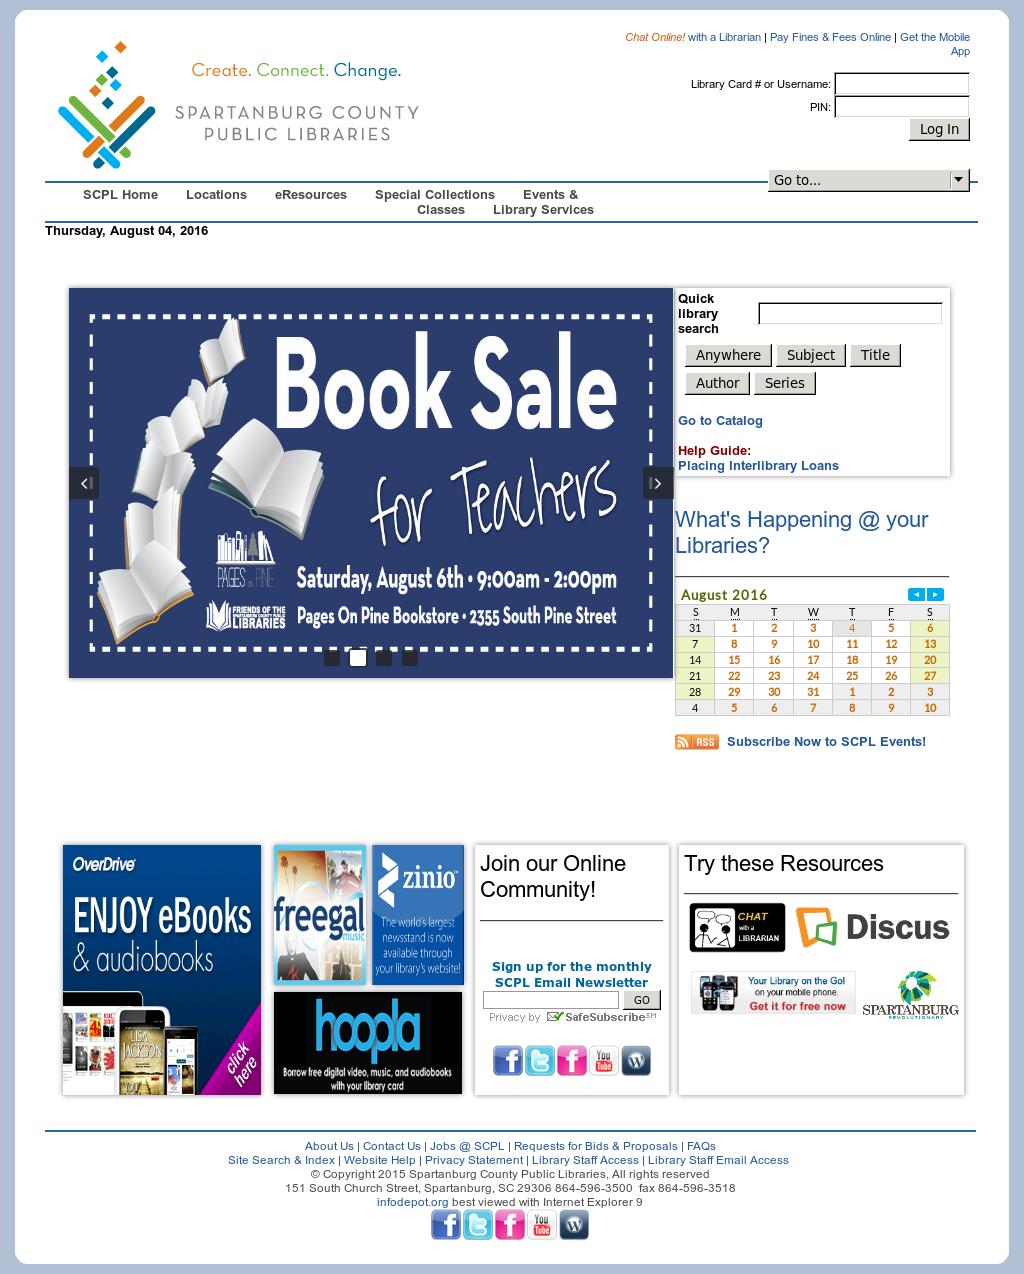 Spartanburg County Public Libraries Competitors, Revenue and